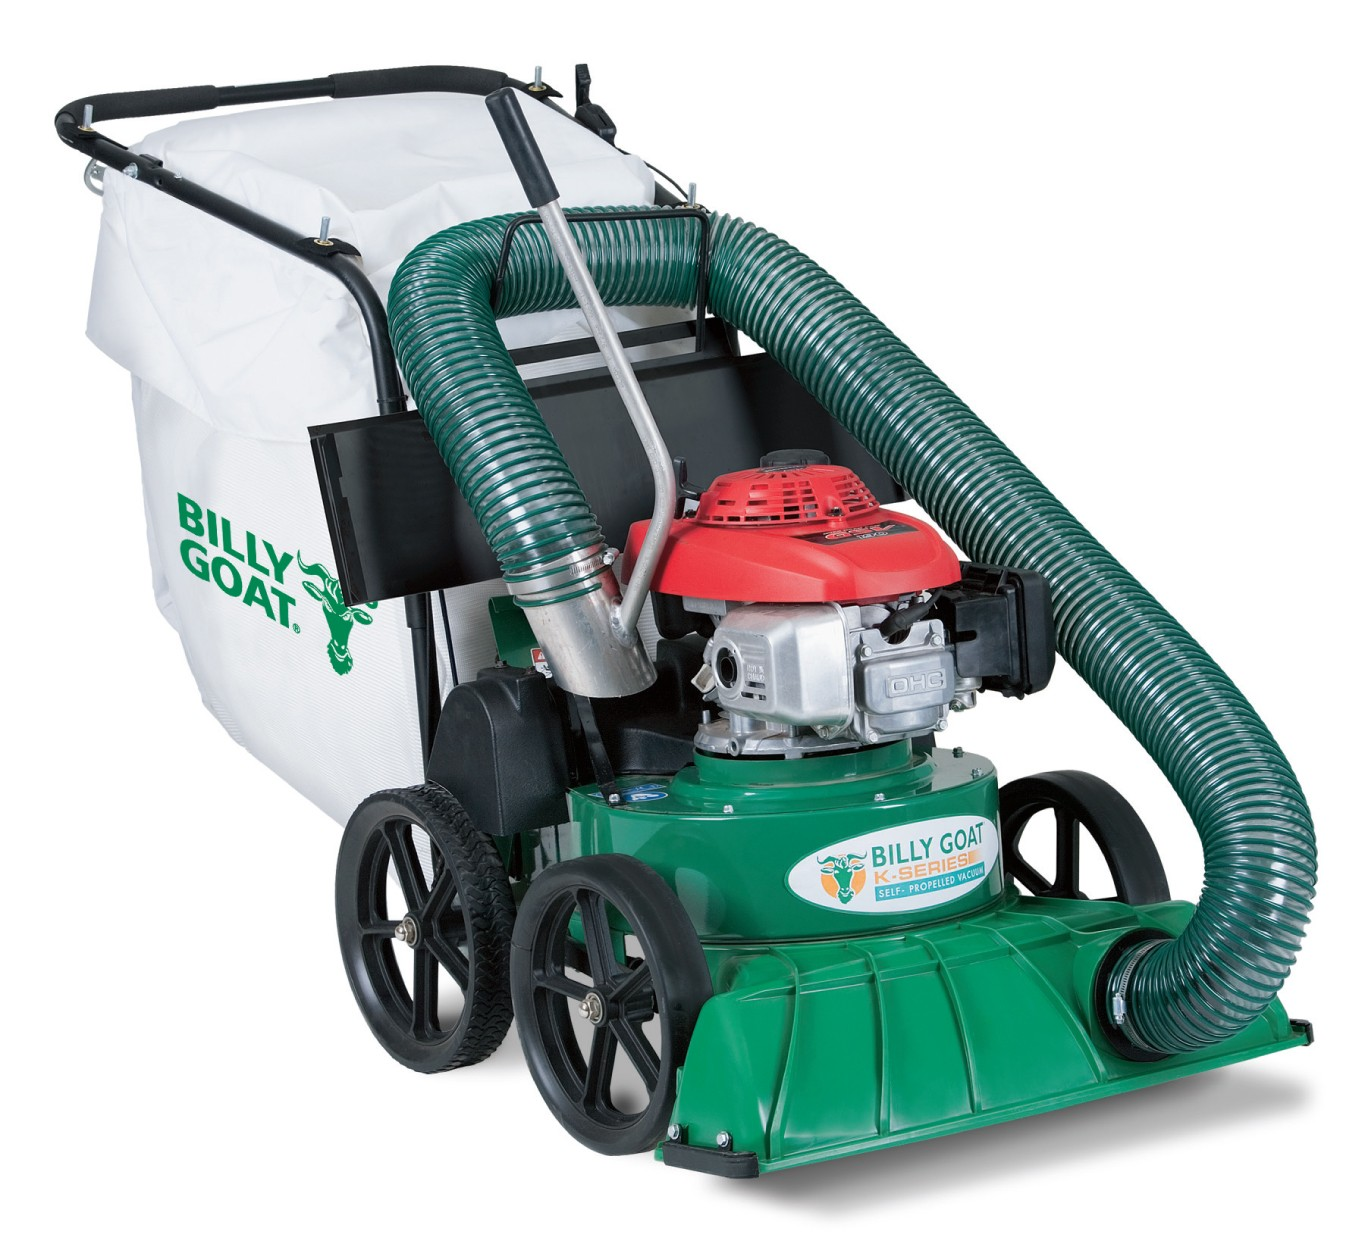 Billy Goat KV650SPH wheeled vacuum